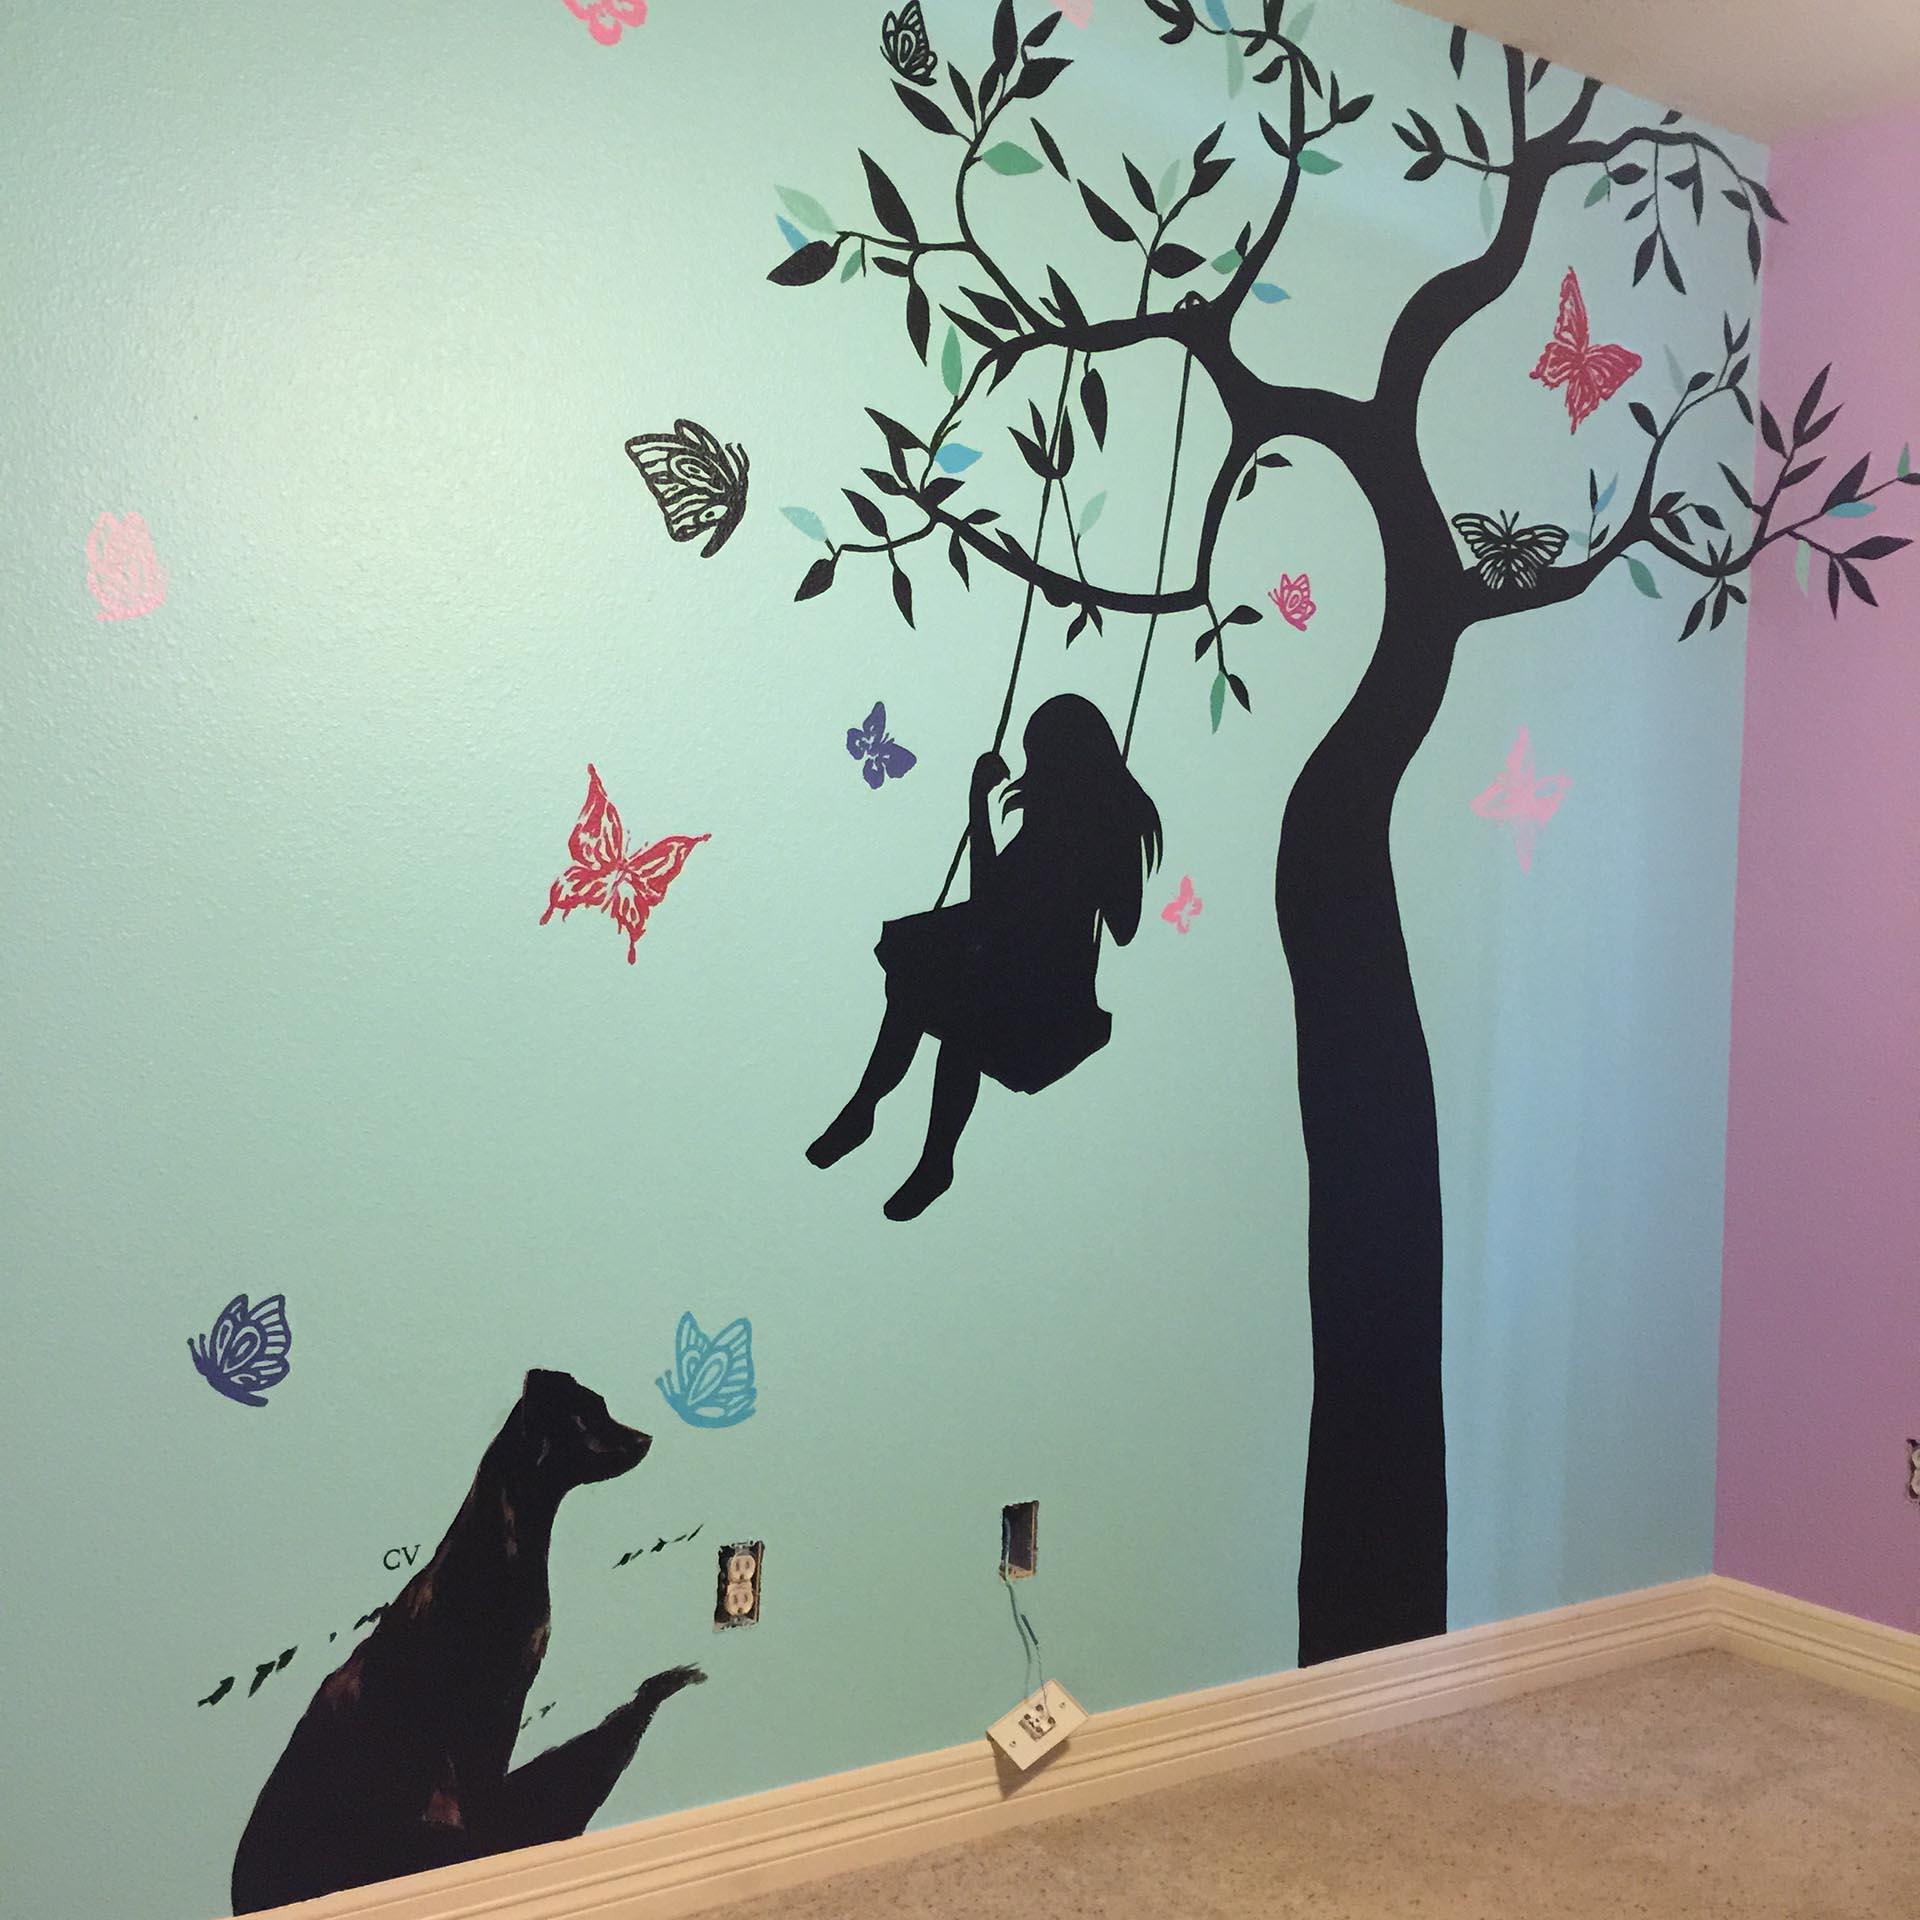 nursery mural - custom mural - mural - Dace Kidd - Mural Artist Tx